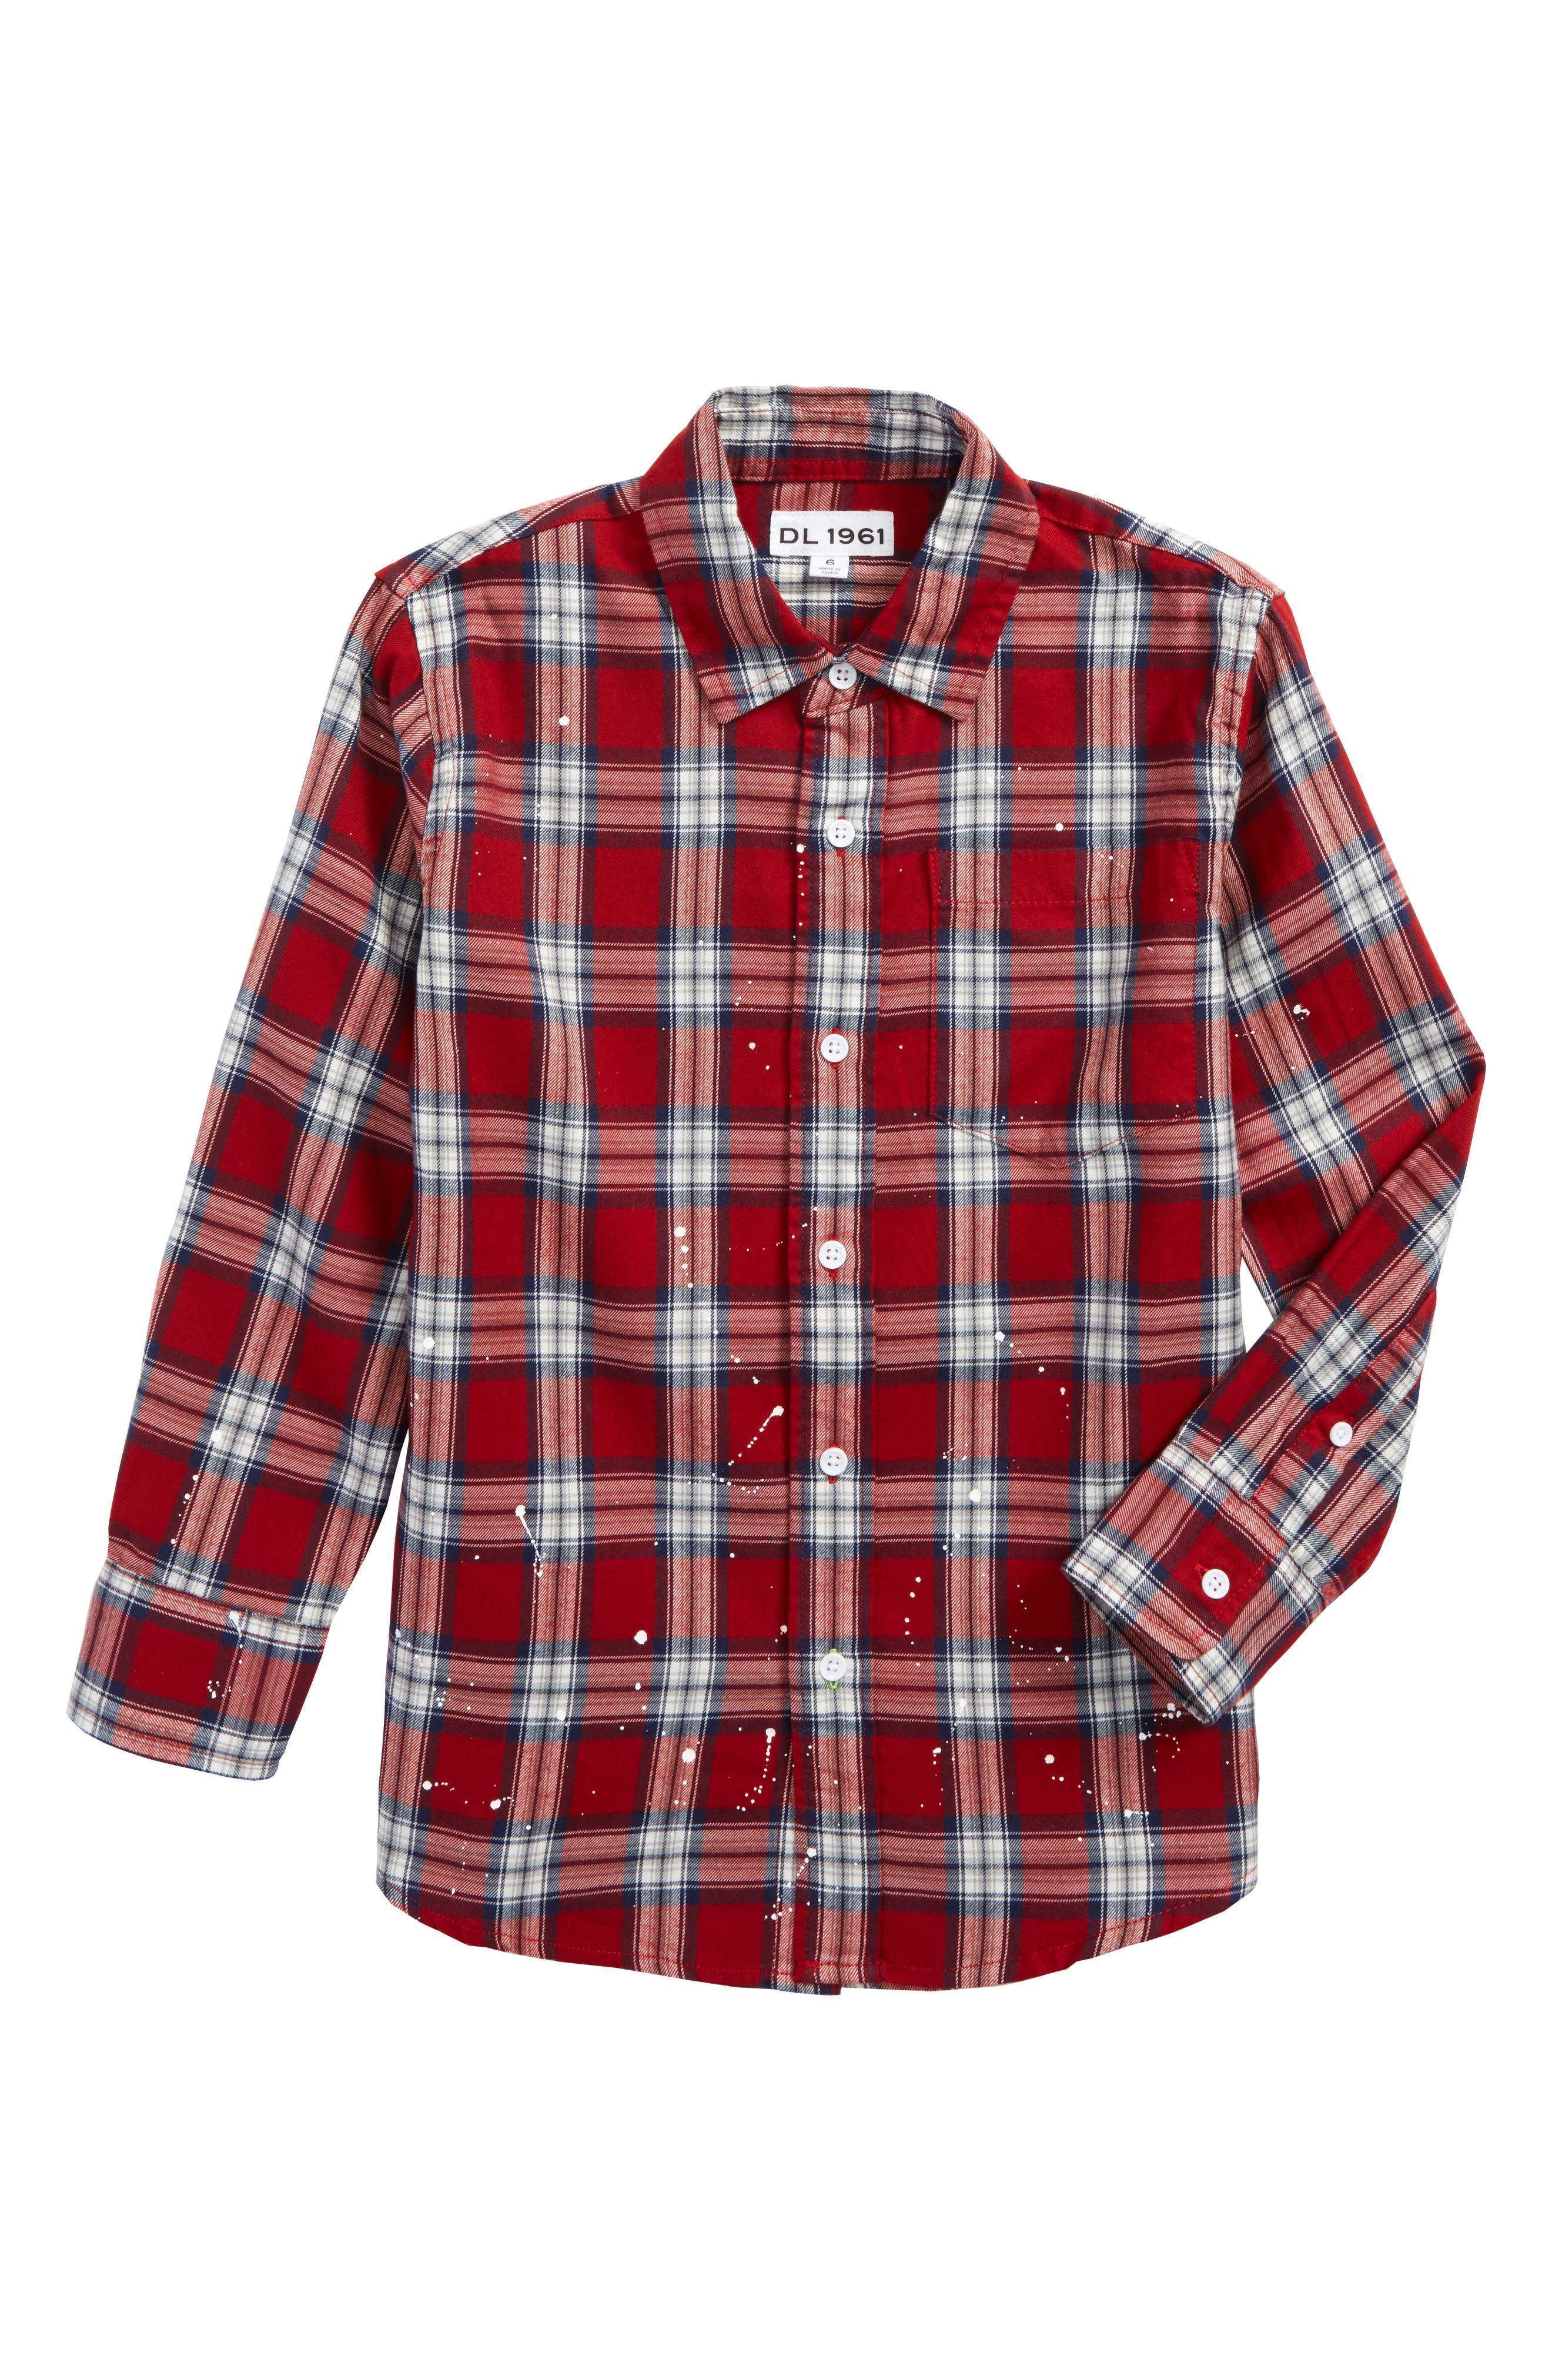 Splattered Plaid Woven Shirt,                         Main,                         color, Red Plaid Paint Splatters